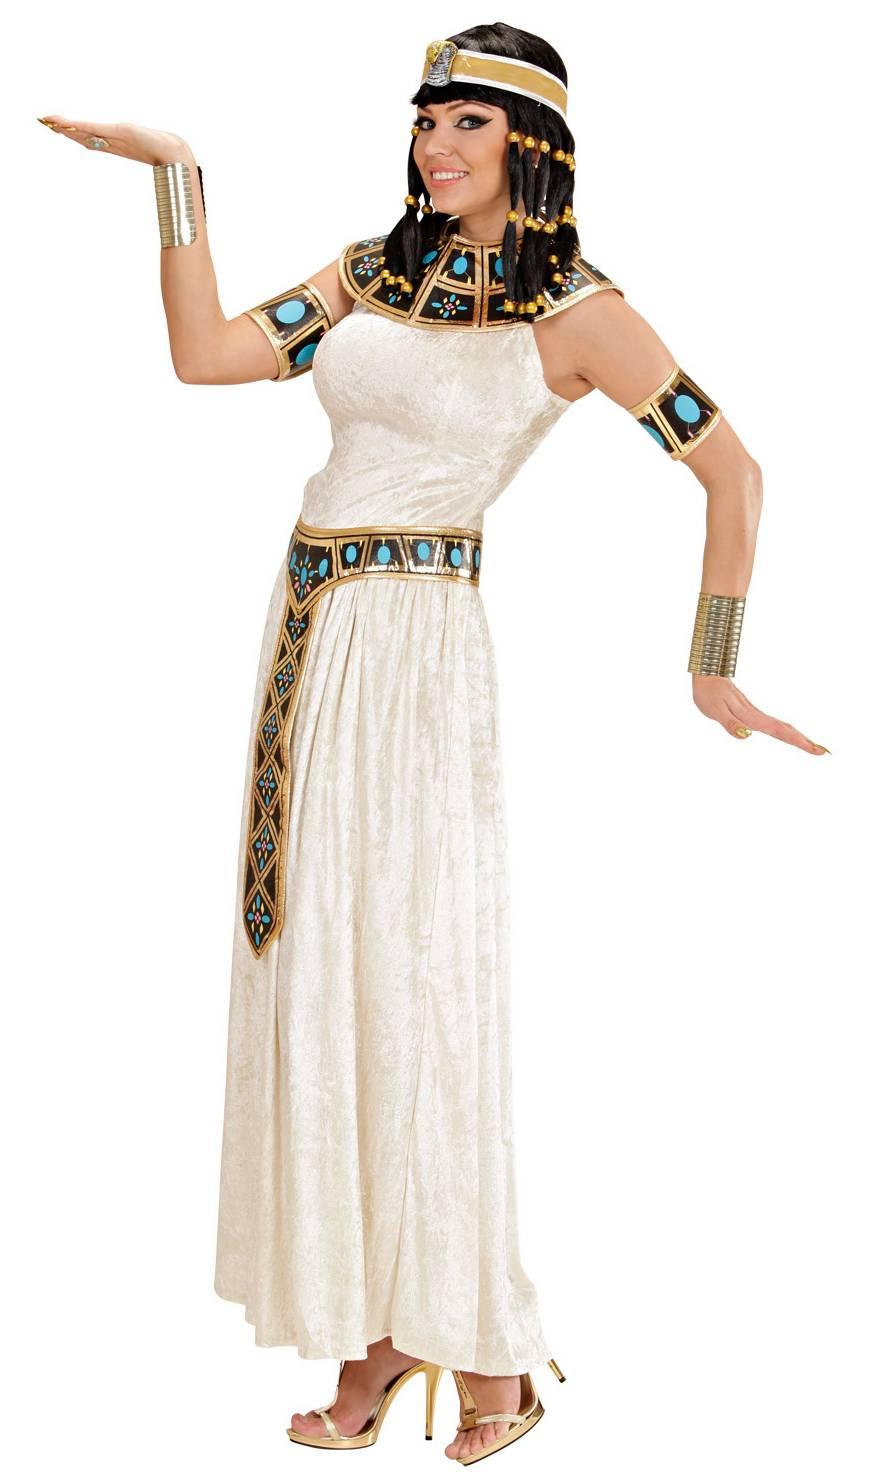 Costume-Néfertiti-2